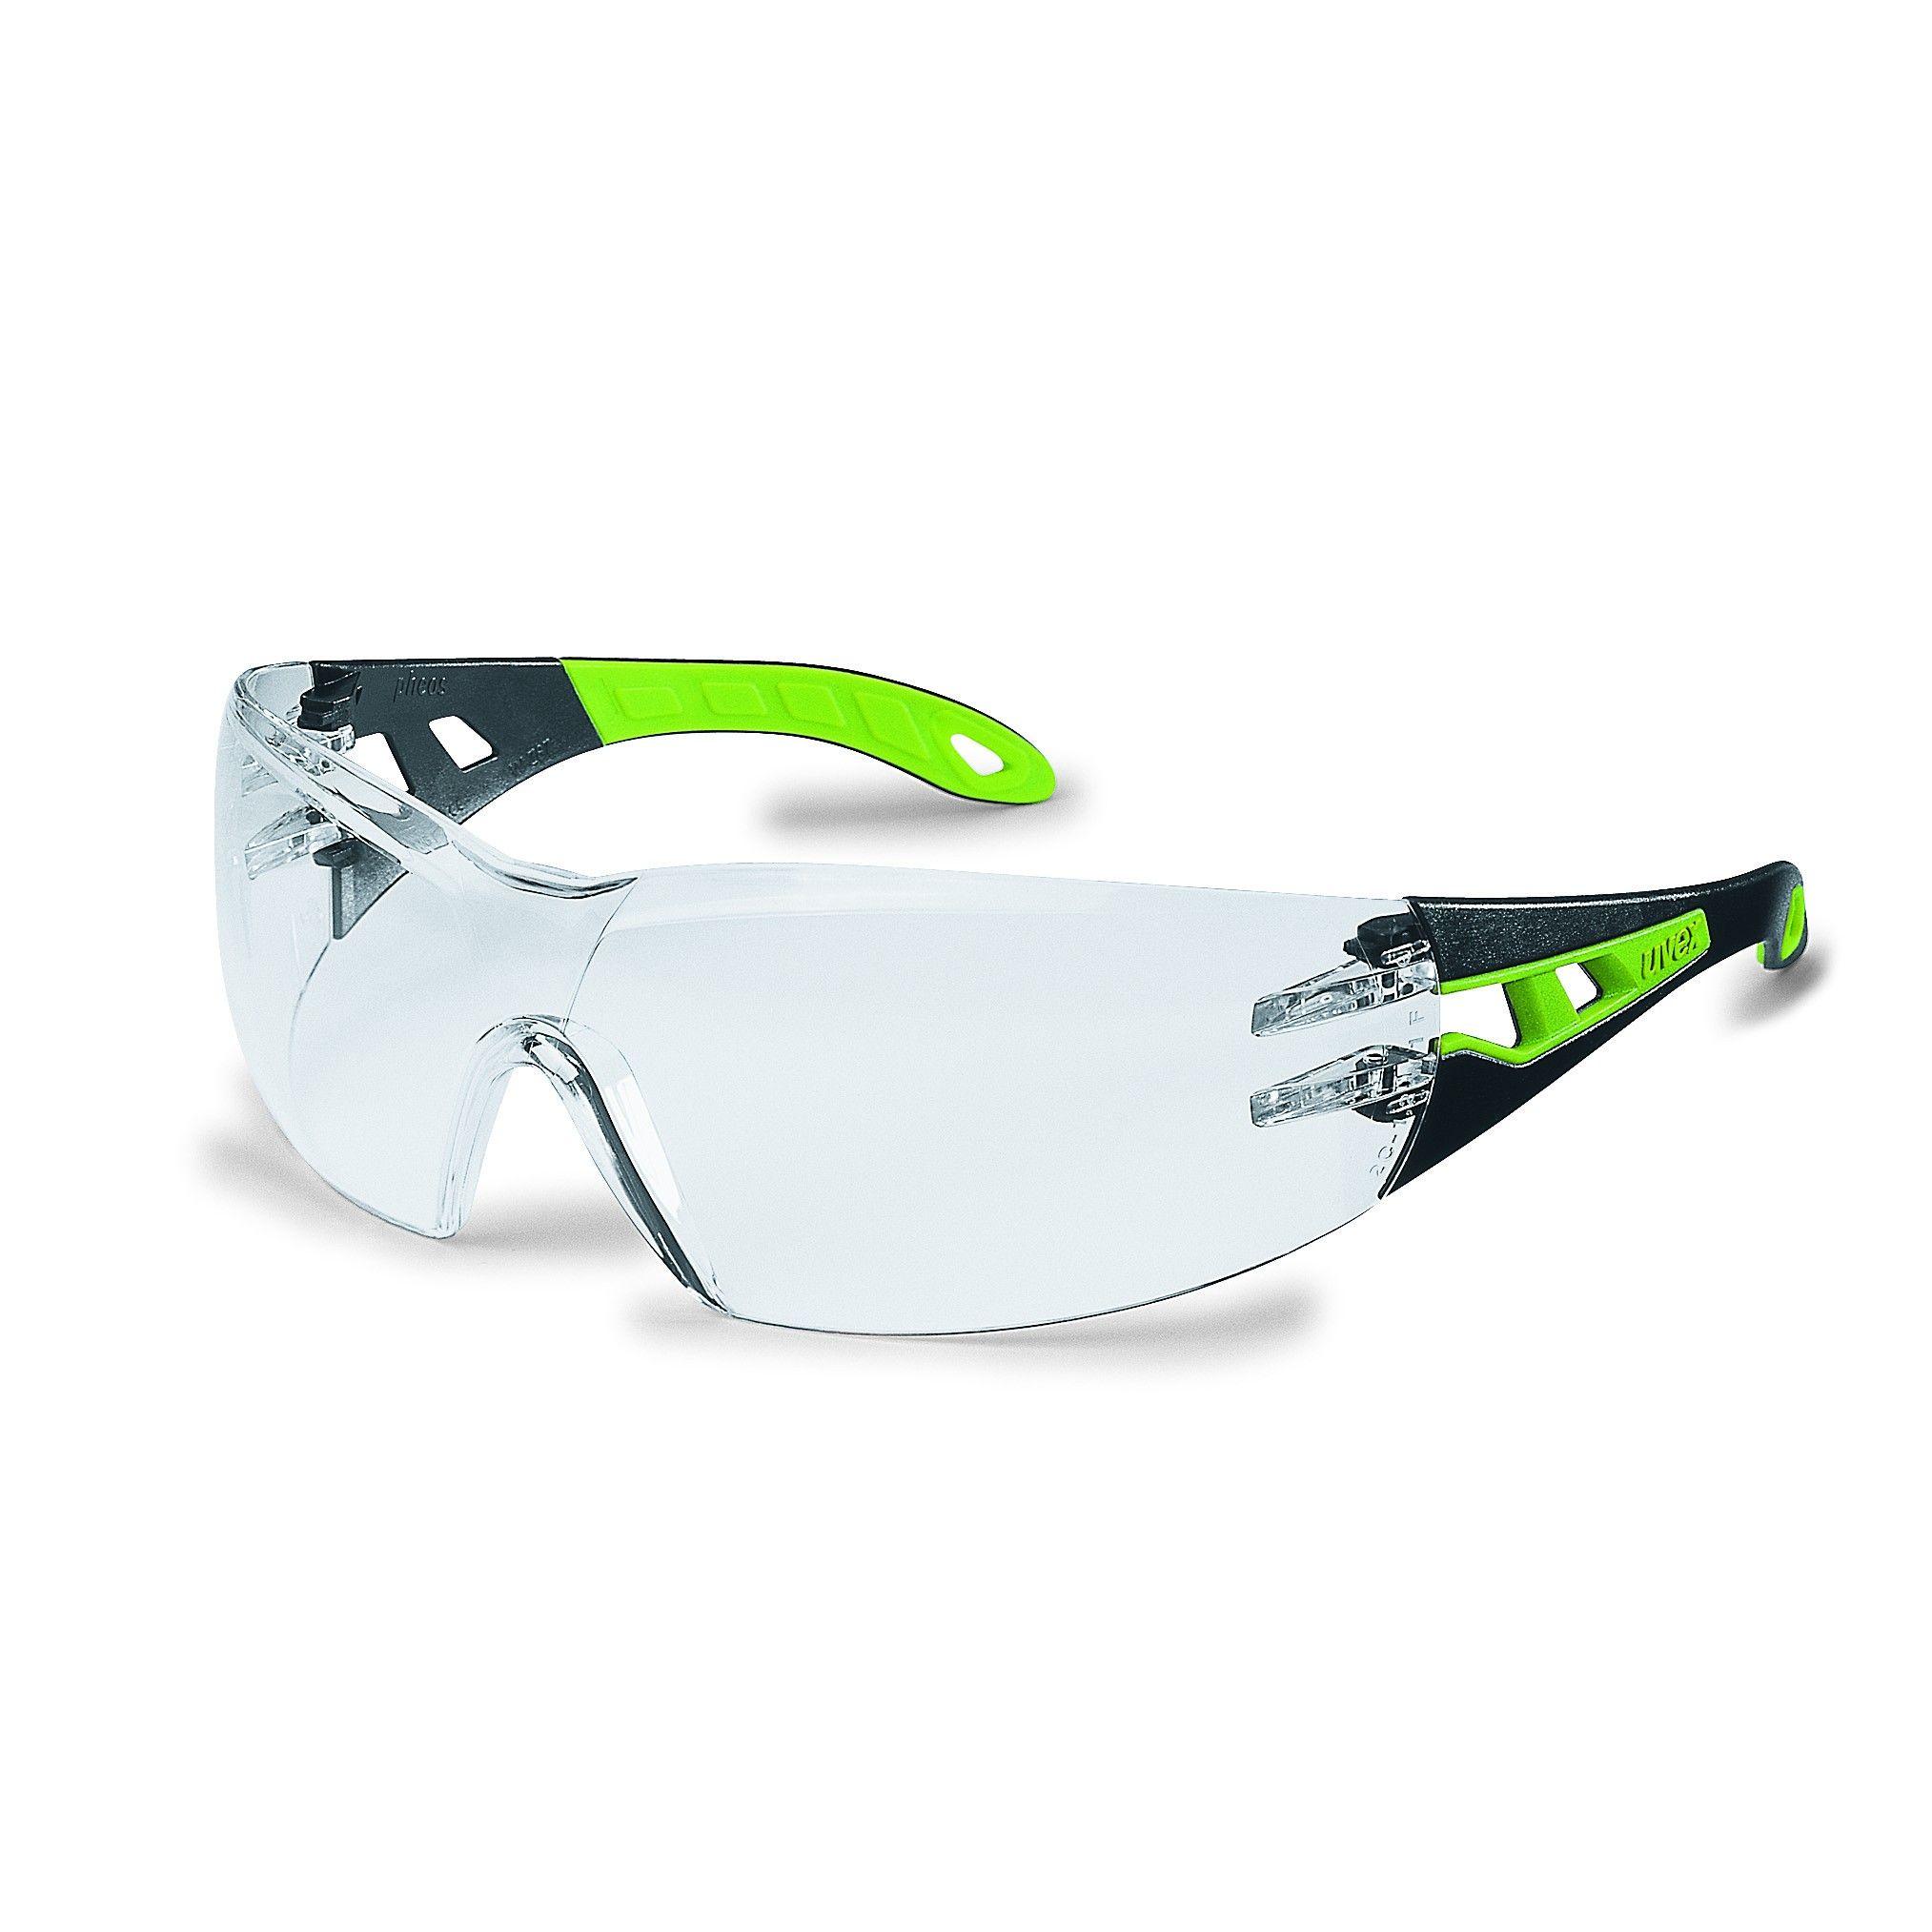 Uvex Pheos (9192225) Romar Innovate Sunglasses